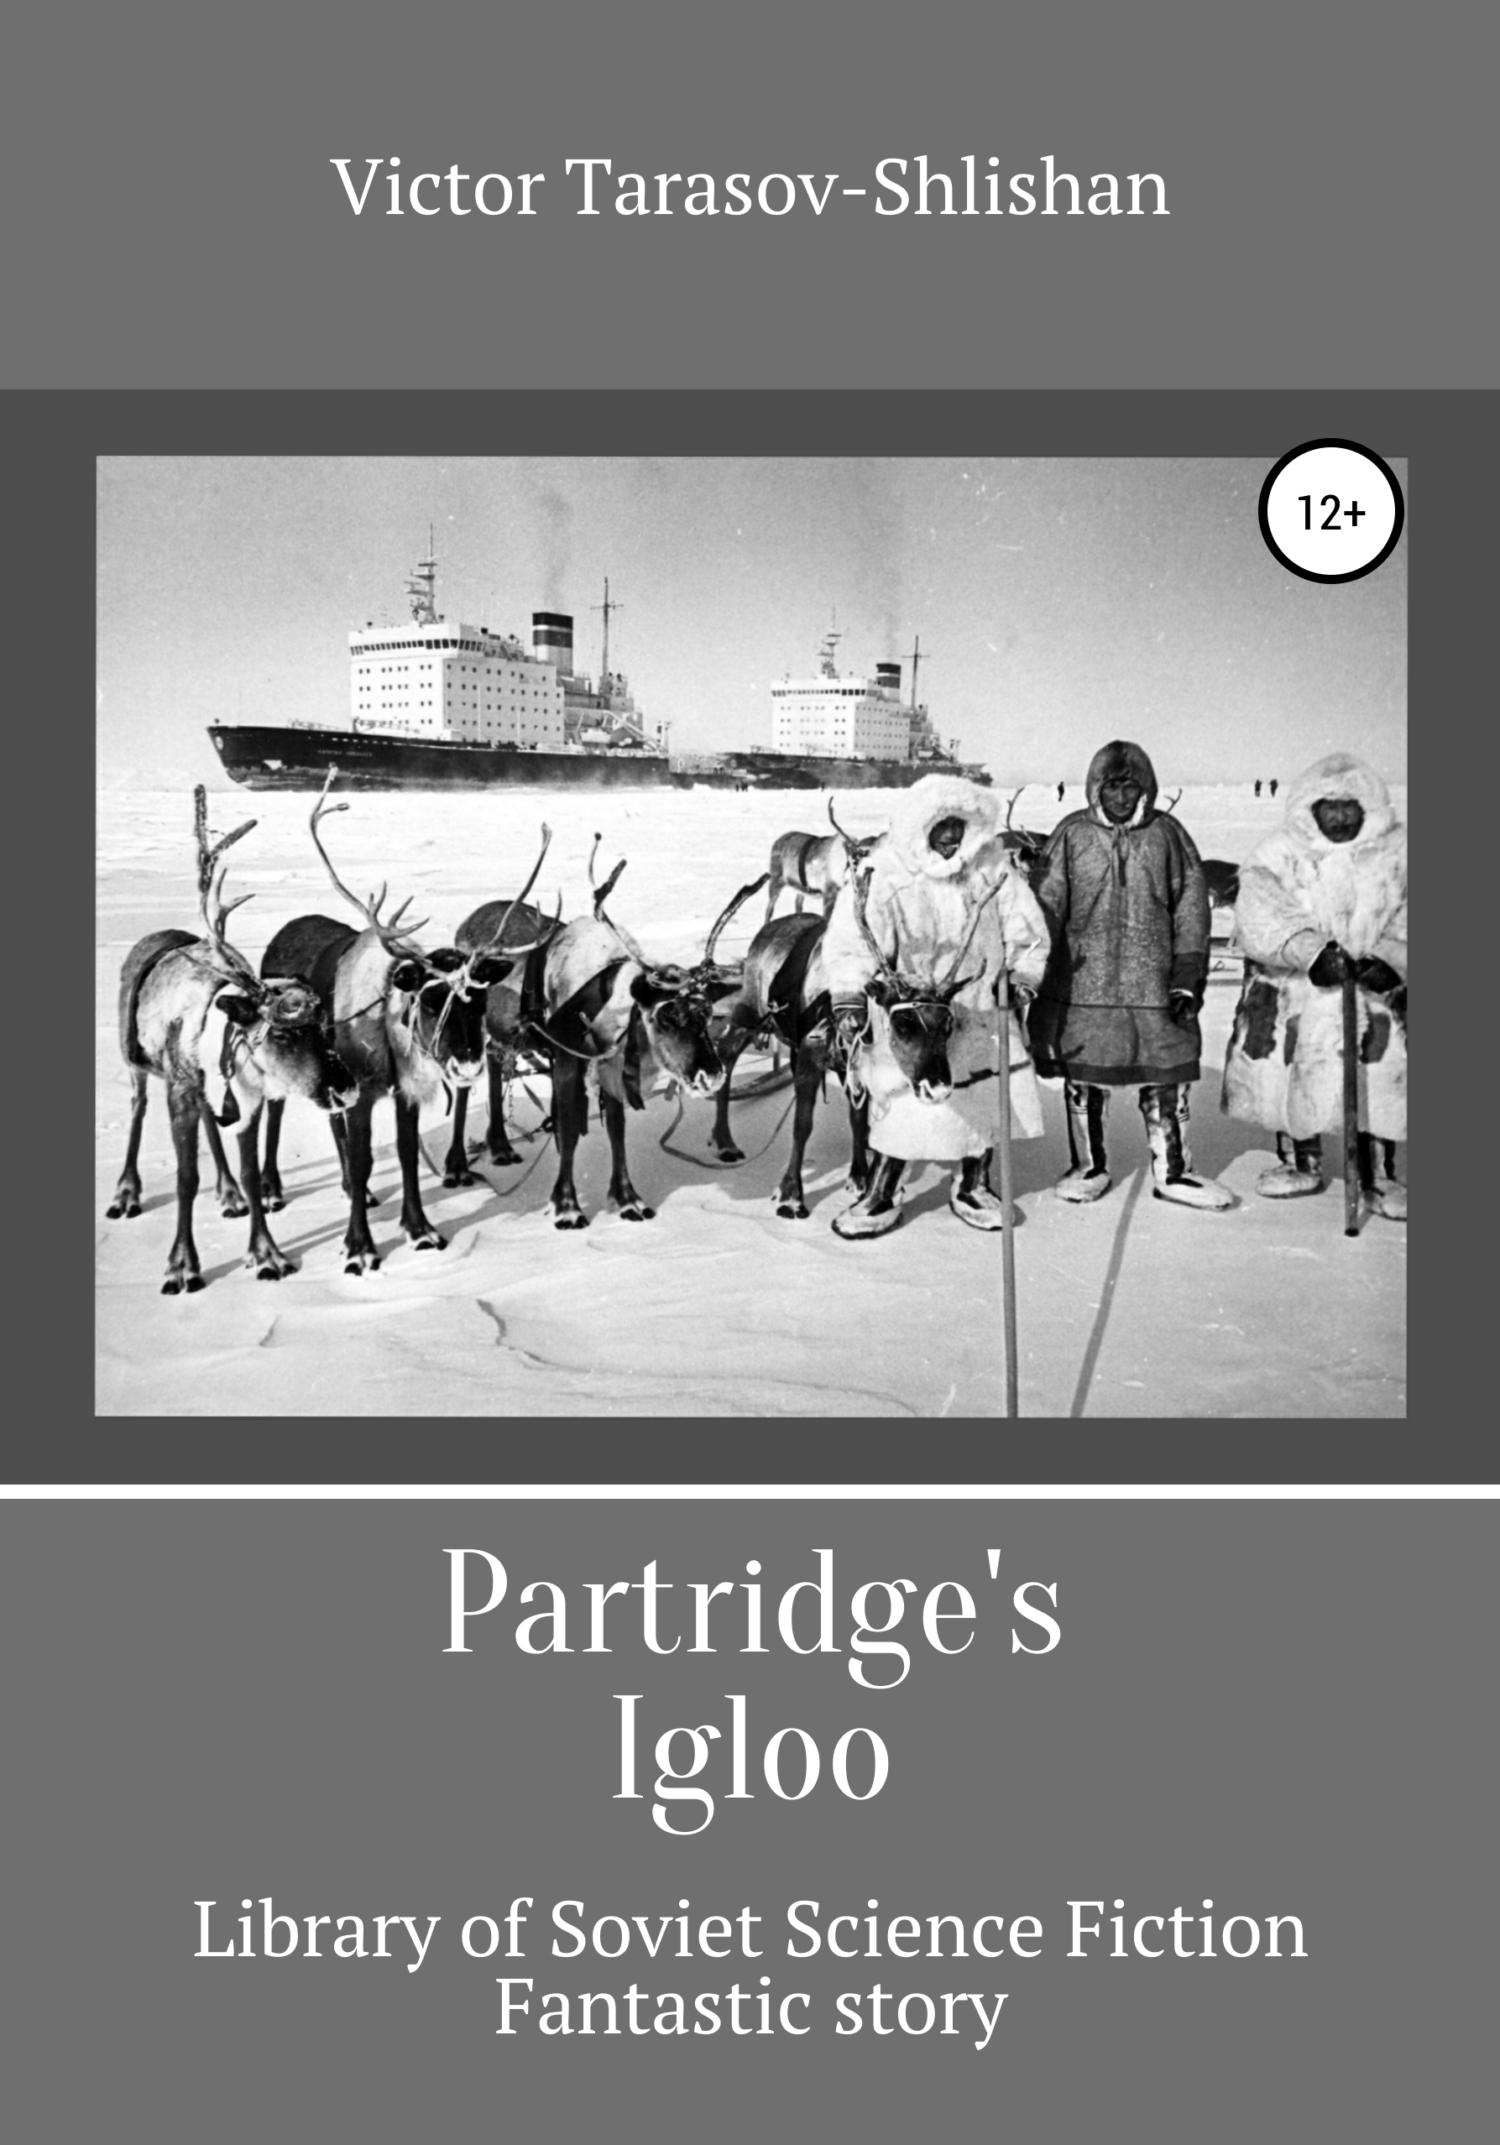 Partridge's igloo